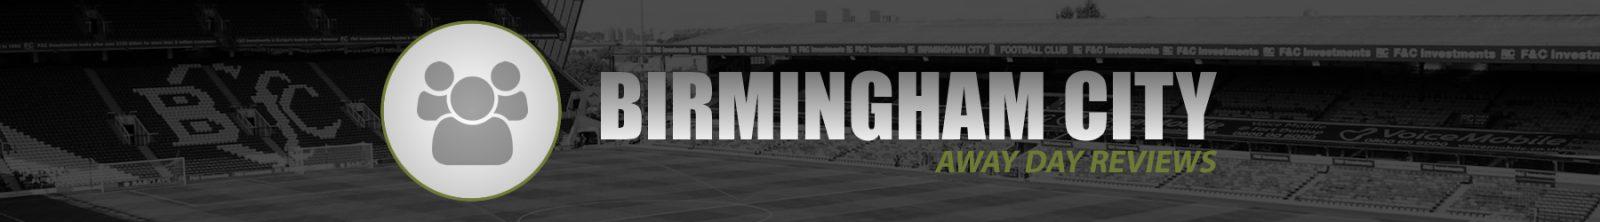 Review Birmingham City